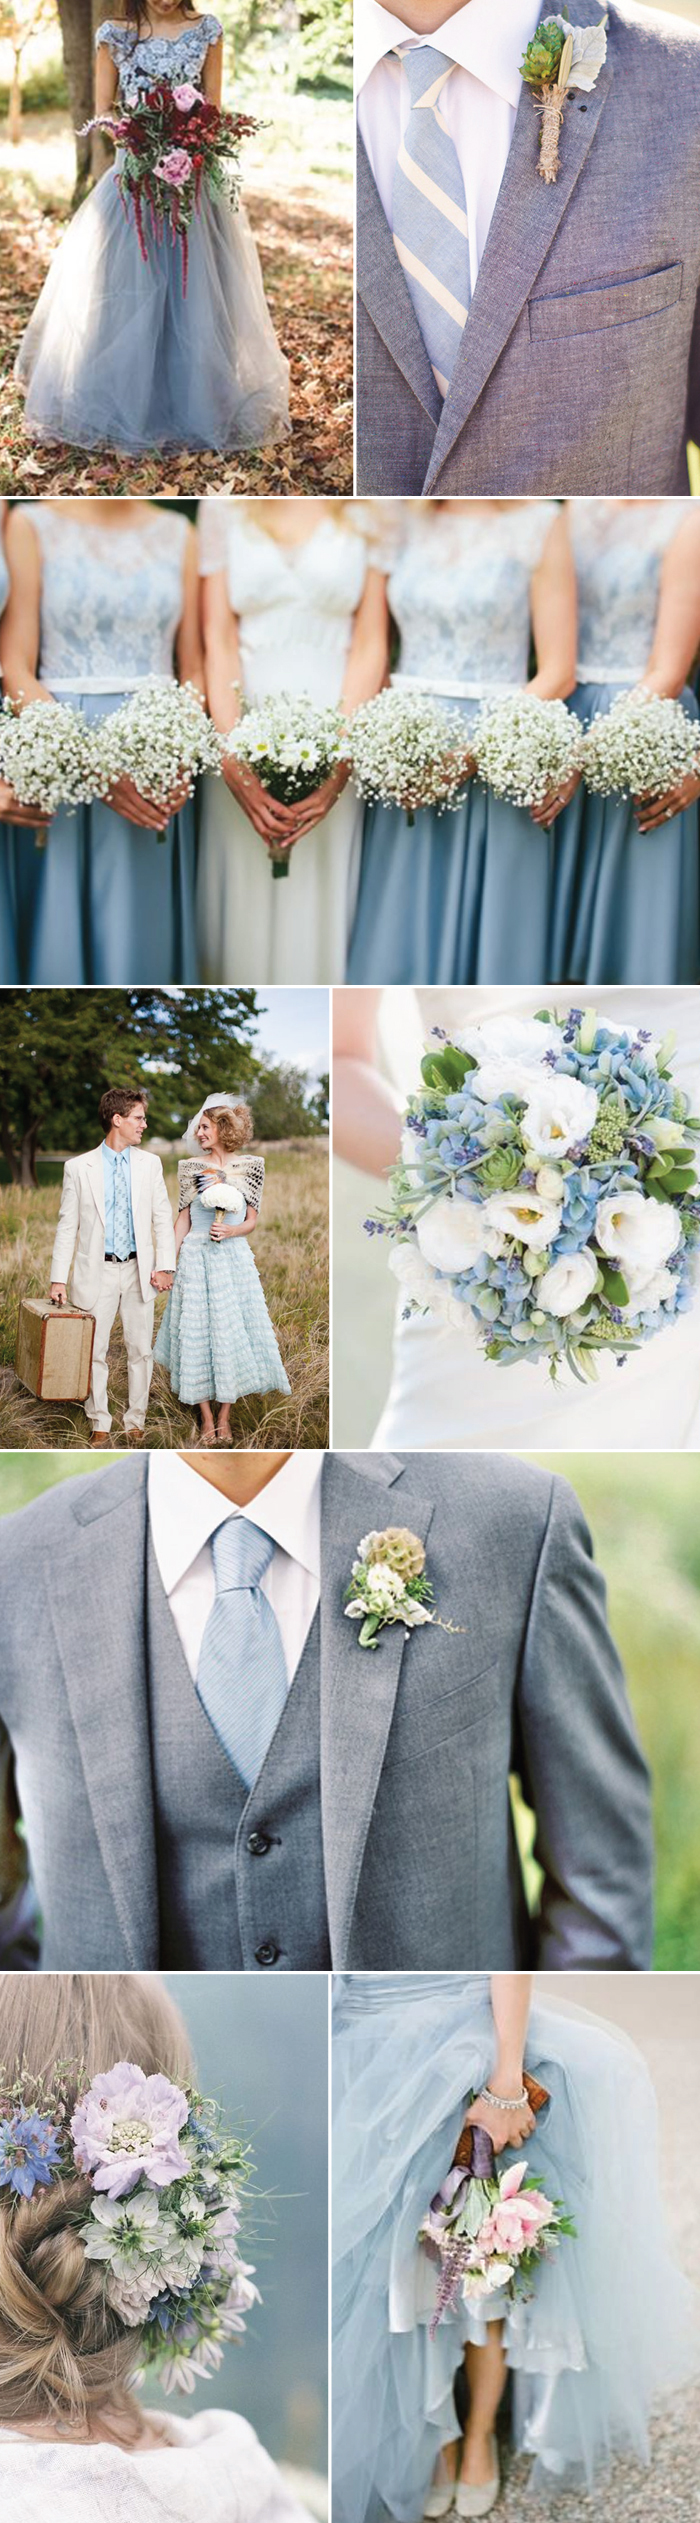 Wedding Inspiration in Serenity Blue